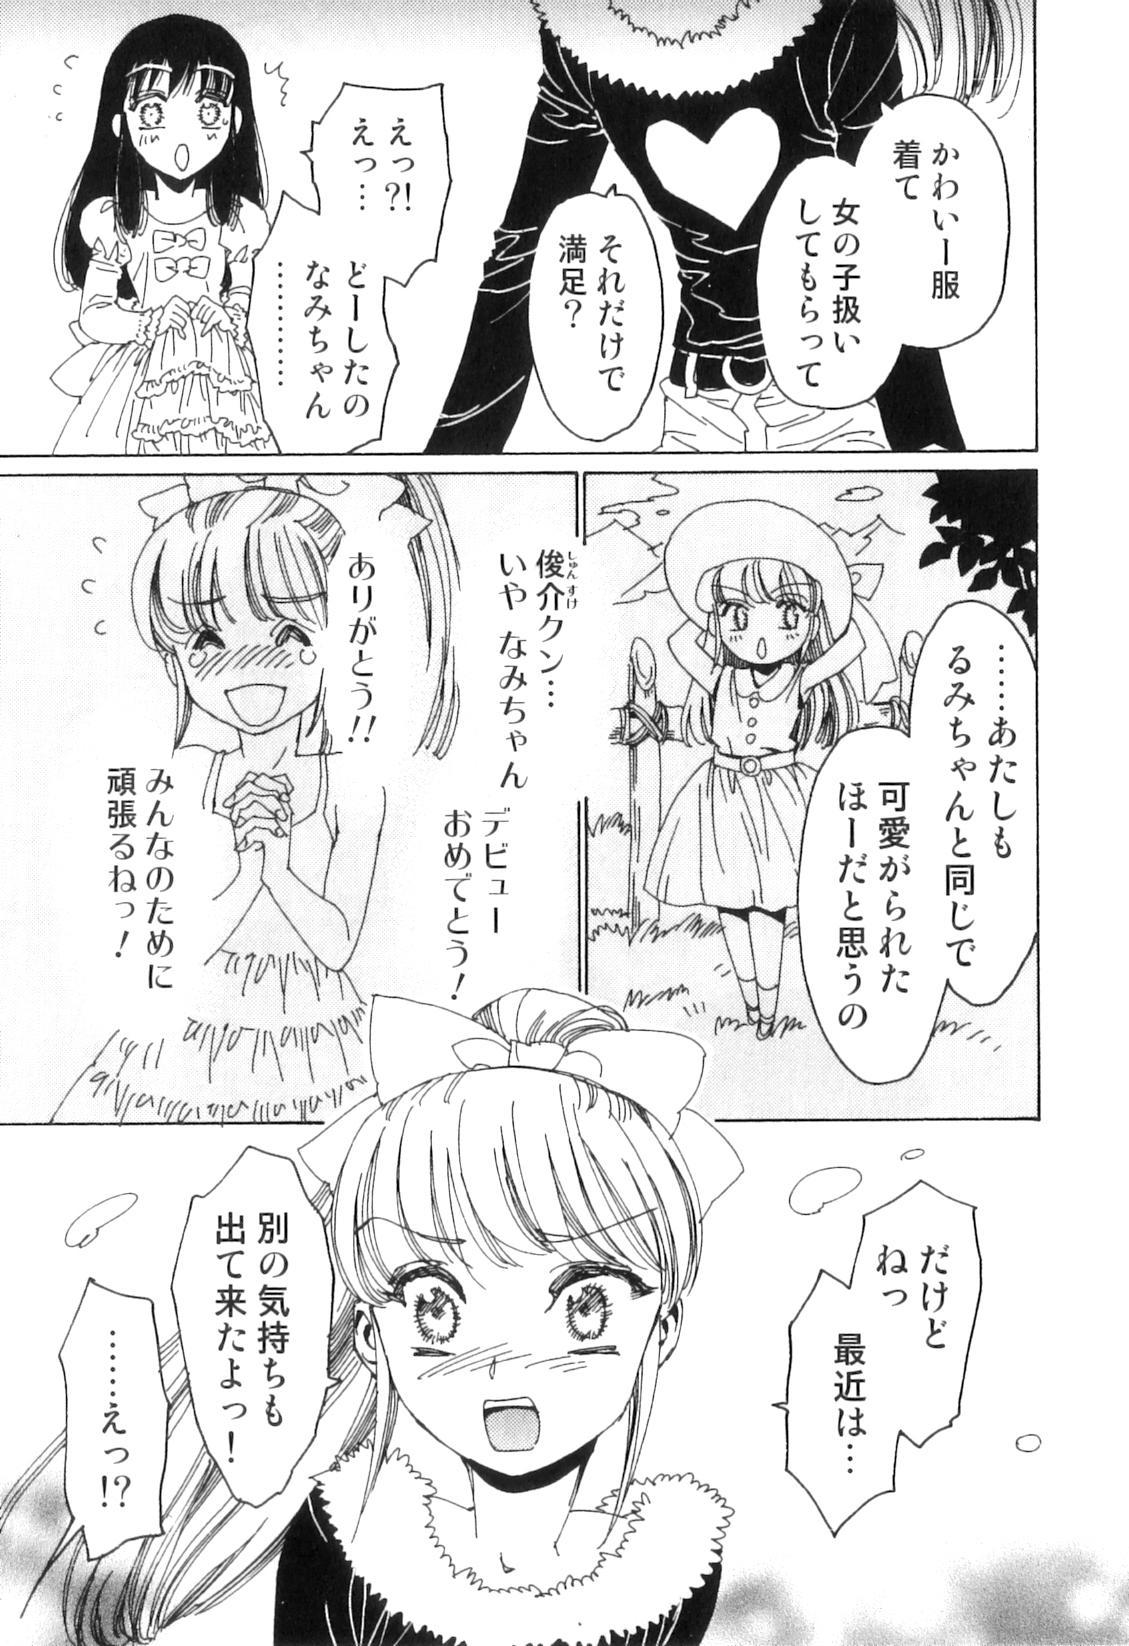 Yuni-Hapi 17